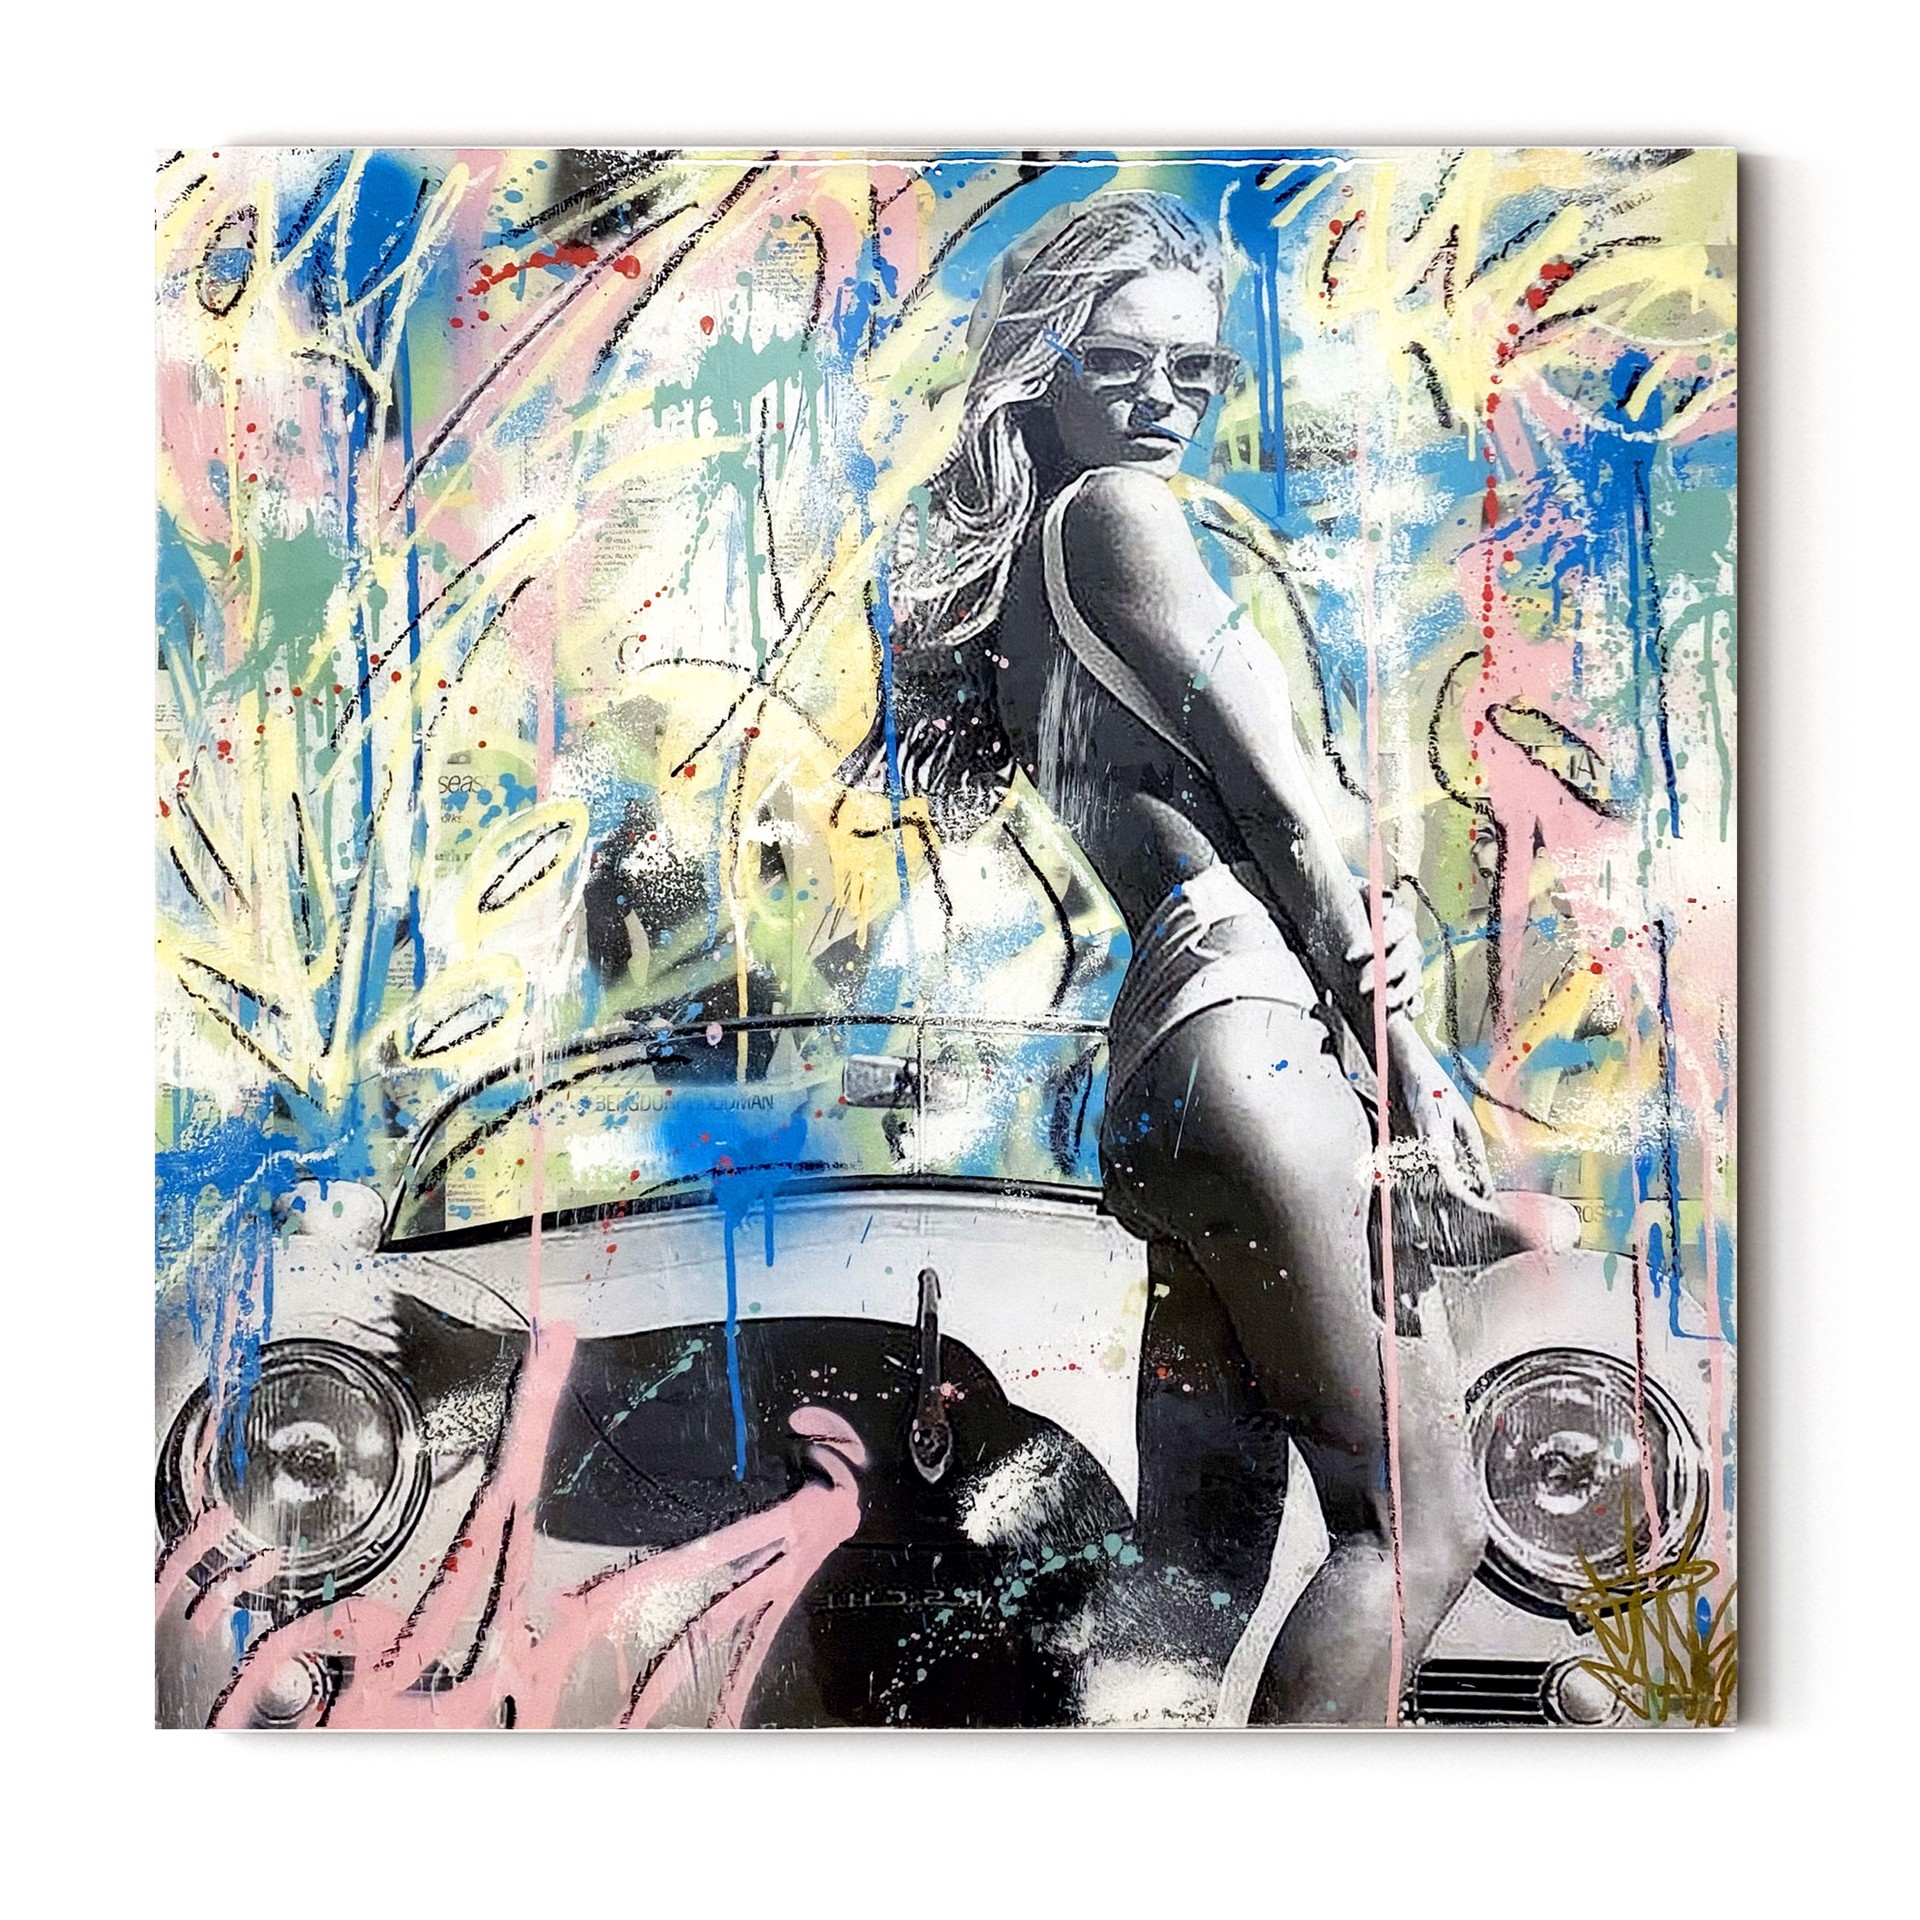 Porsche Girl by Seek One